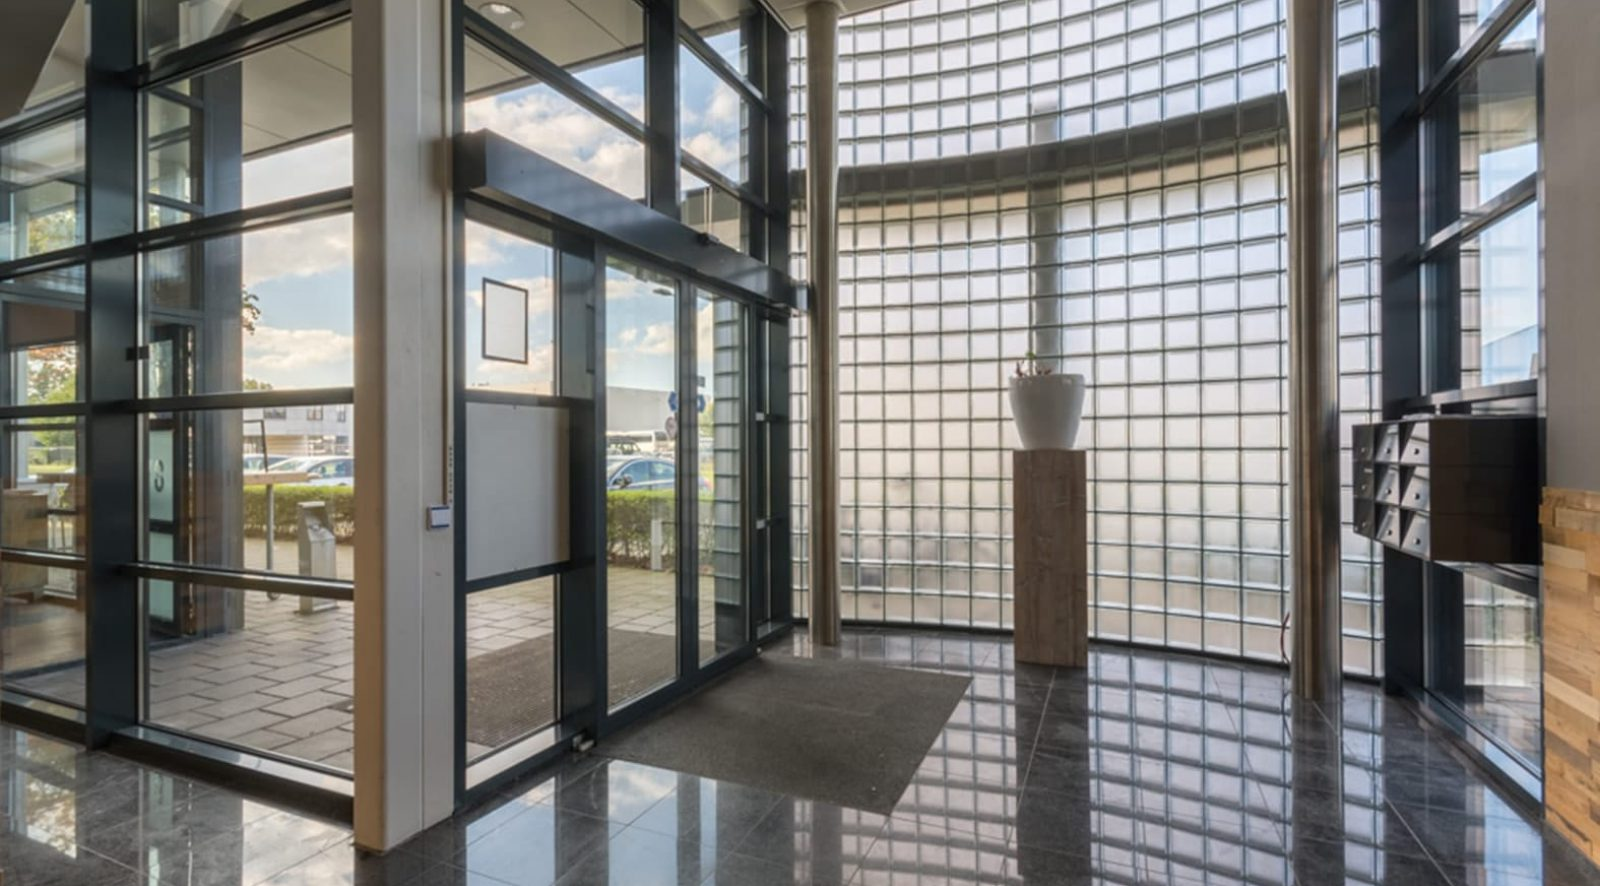 Ontvangstruimte Crown Business Center Haarlem II | Bedrijfsruimte huren